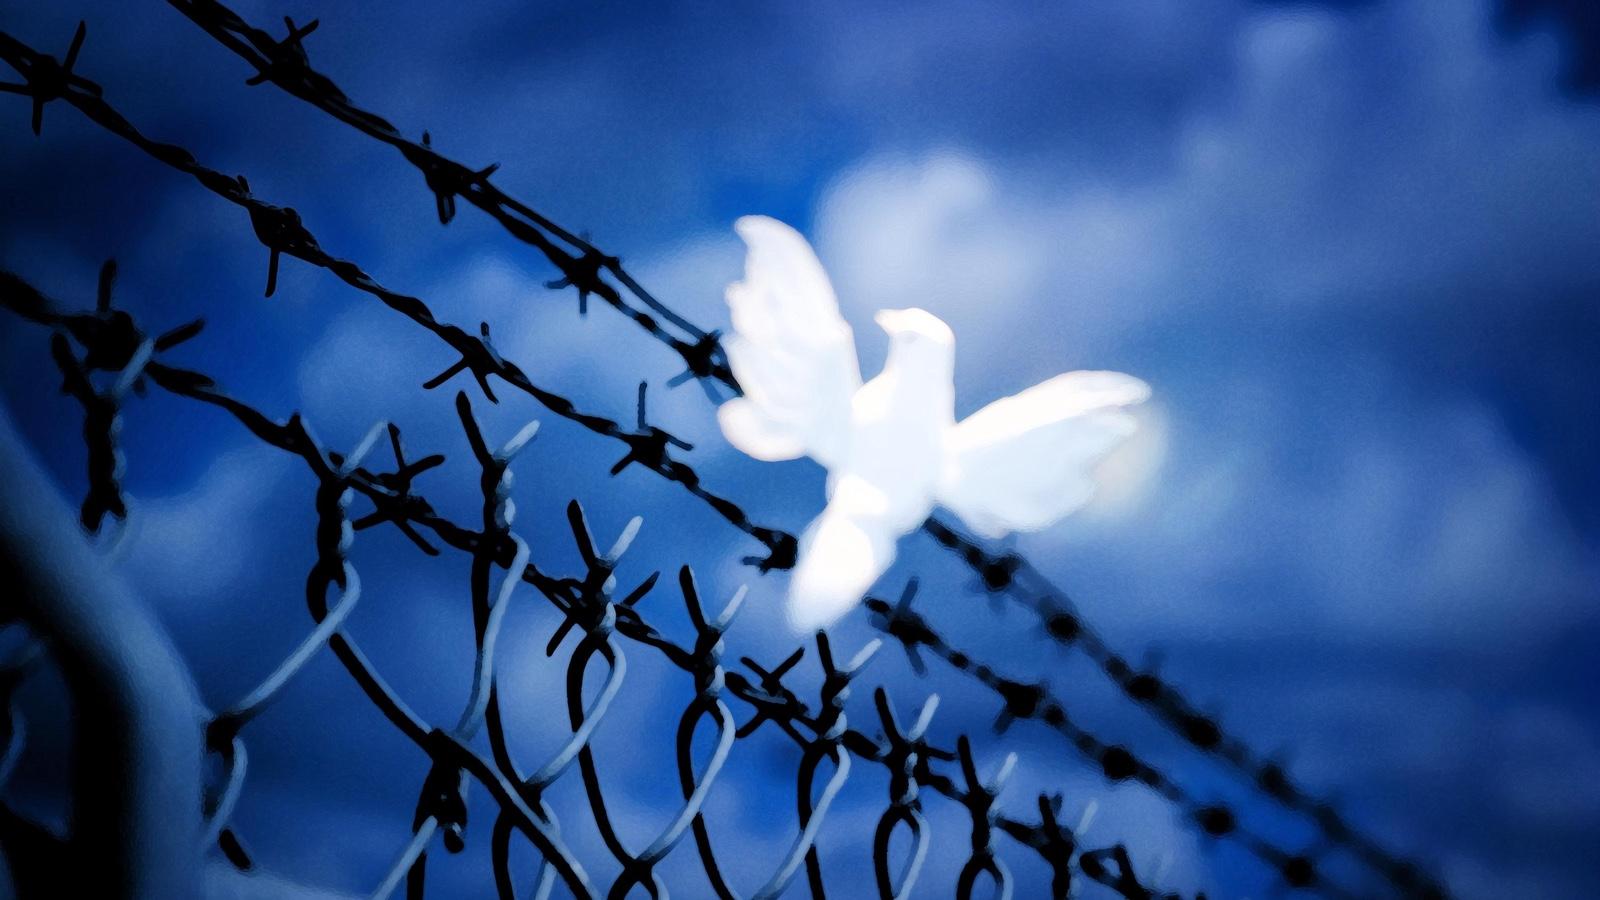 Hope for a future of peace